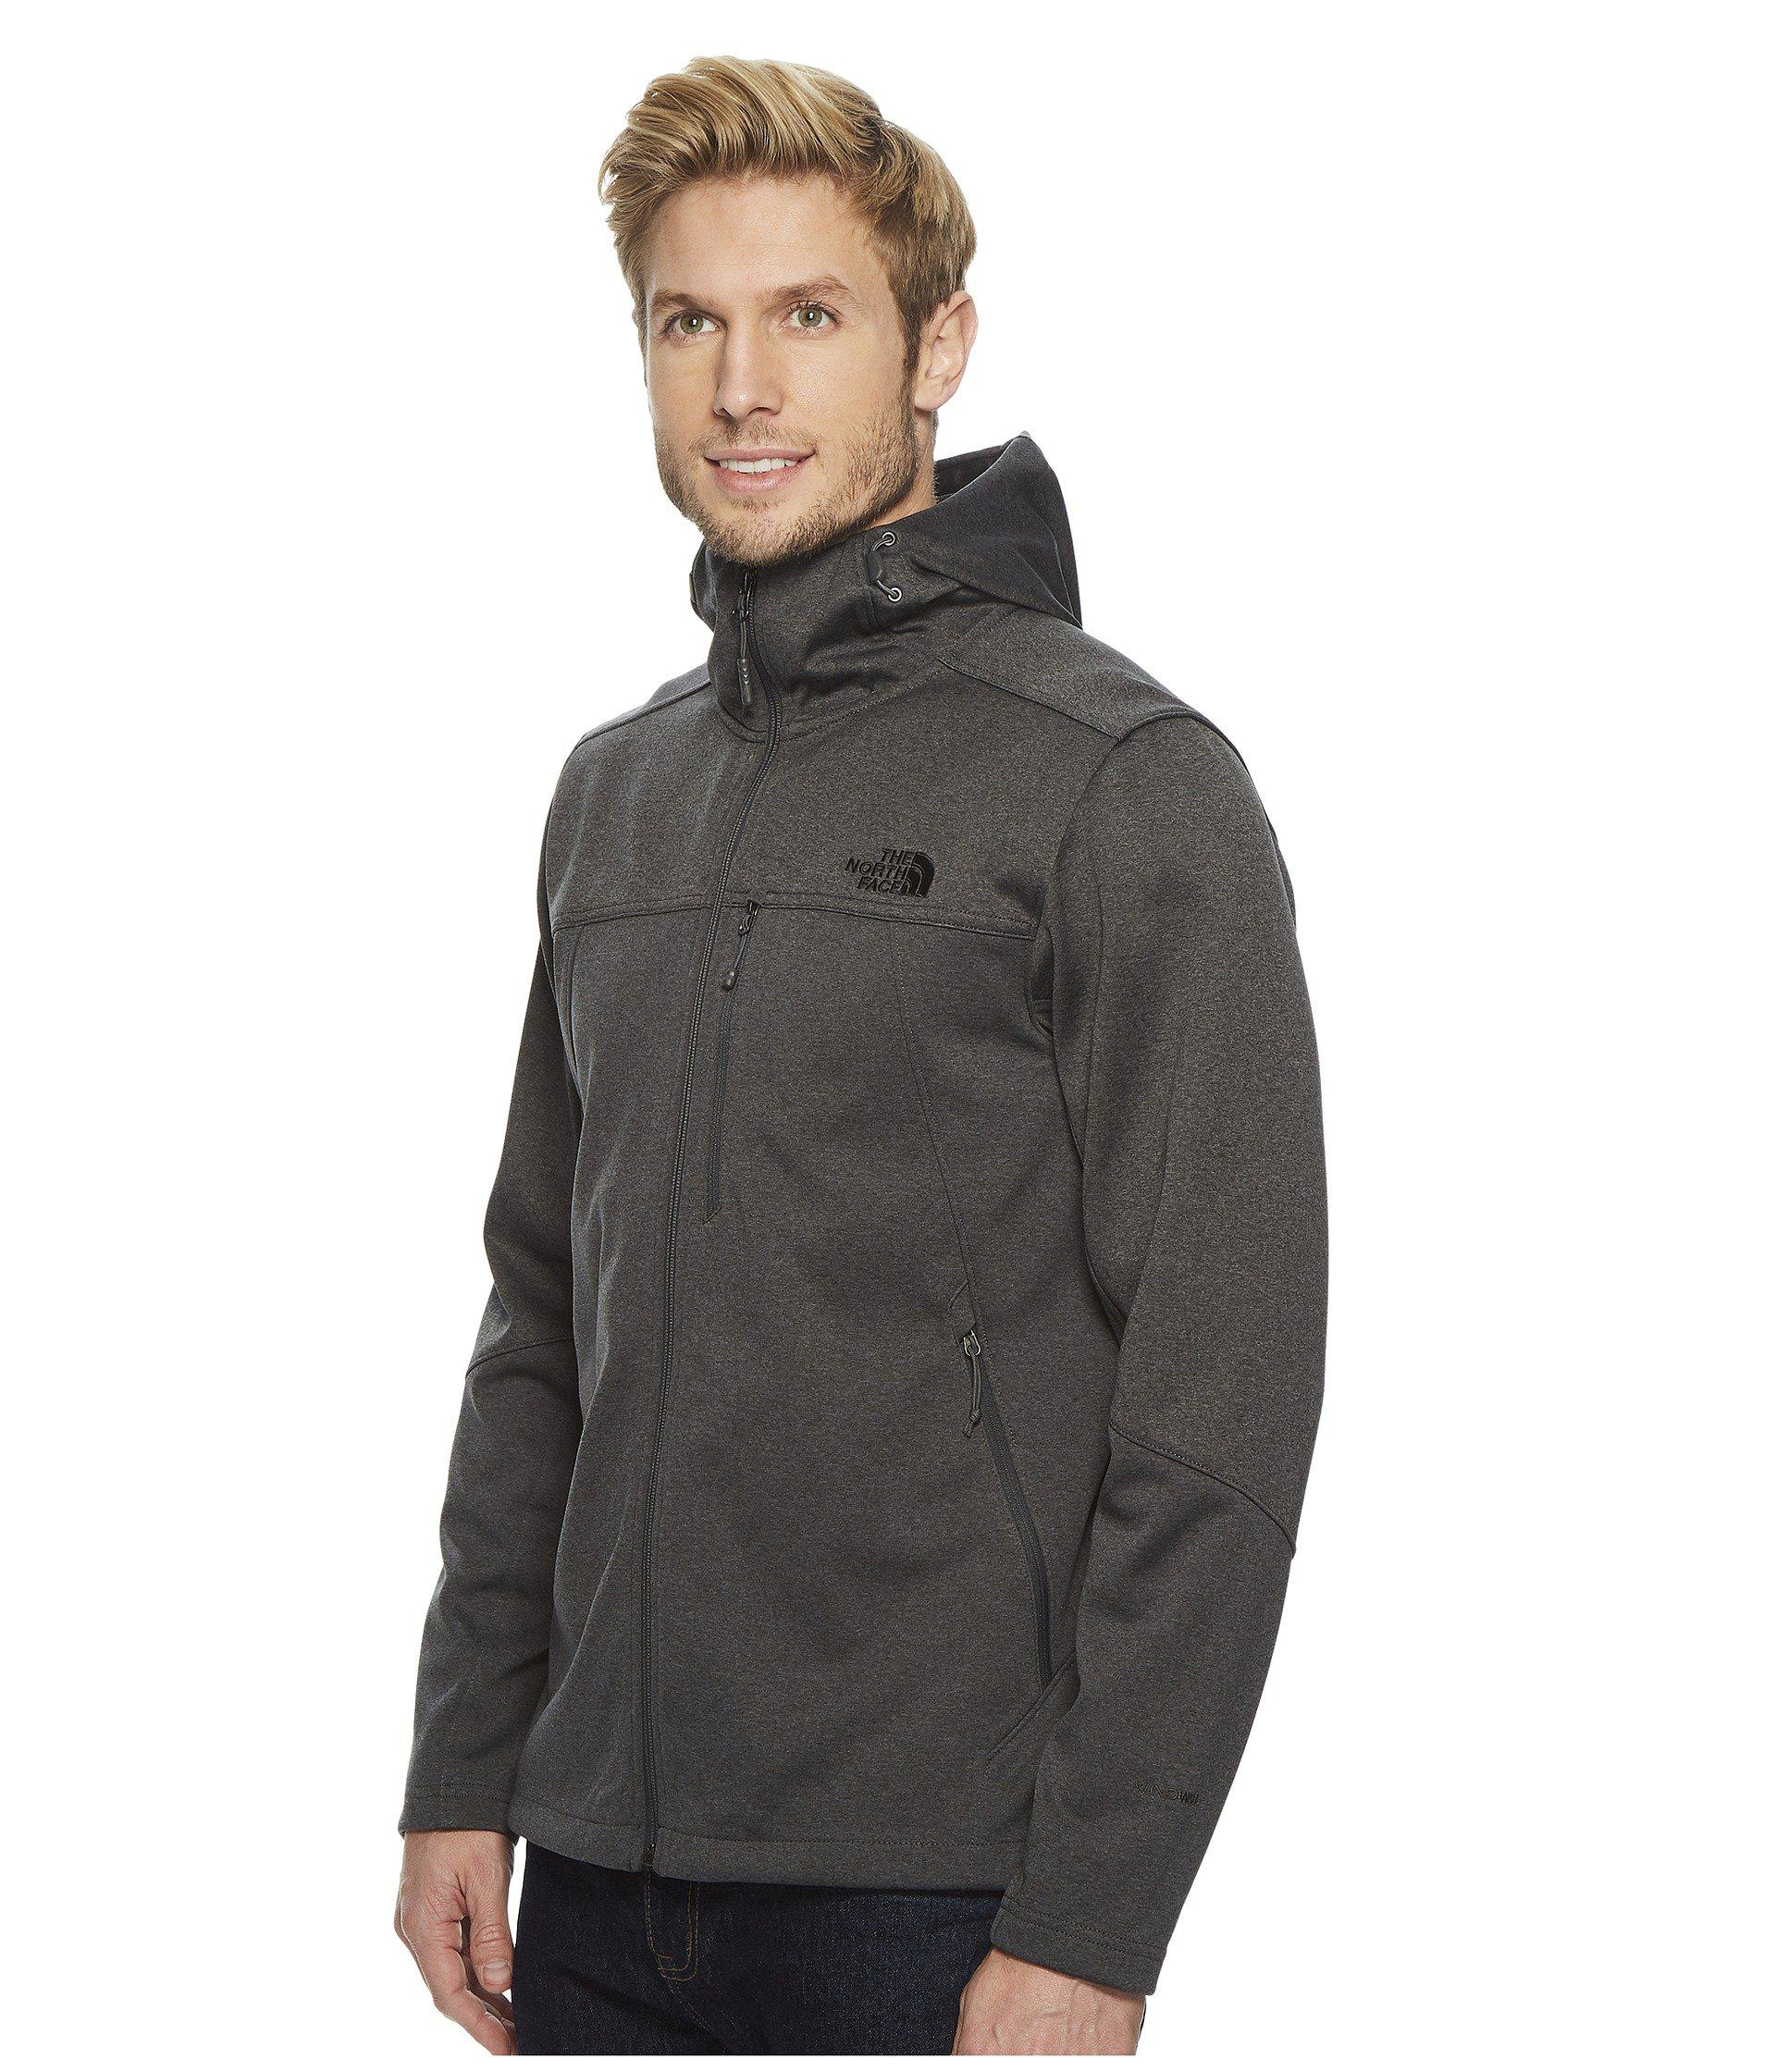 9971fa16530b Lyst - The North Face Apex Canyonwall Hybrid Hoodie (tnf Black tnf Black)  Men s Sweatshirt in Gray for Men